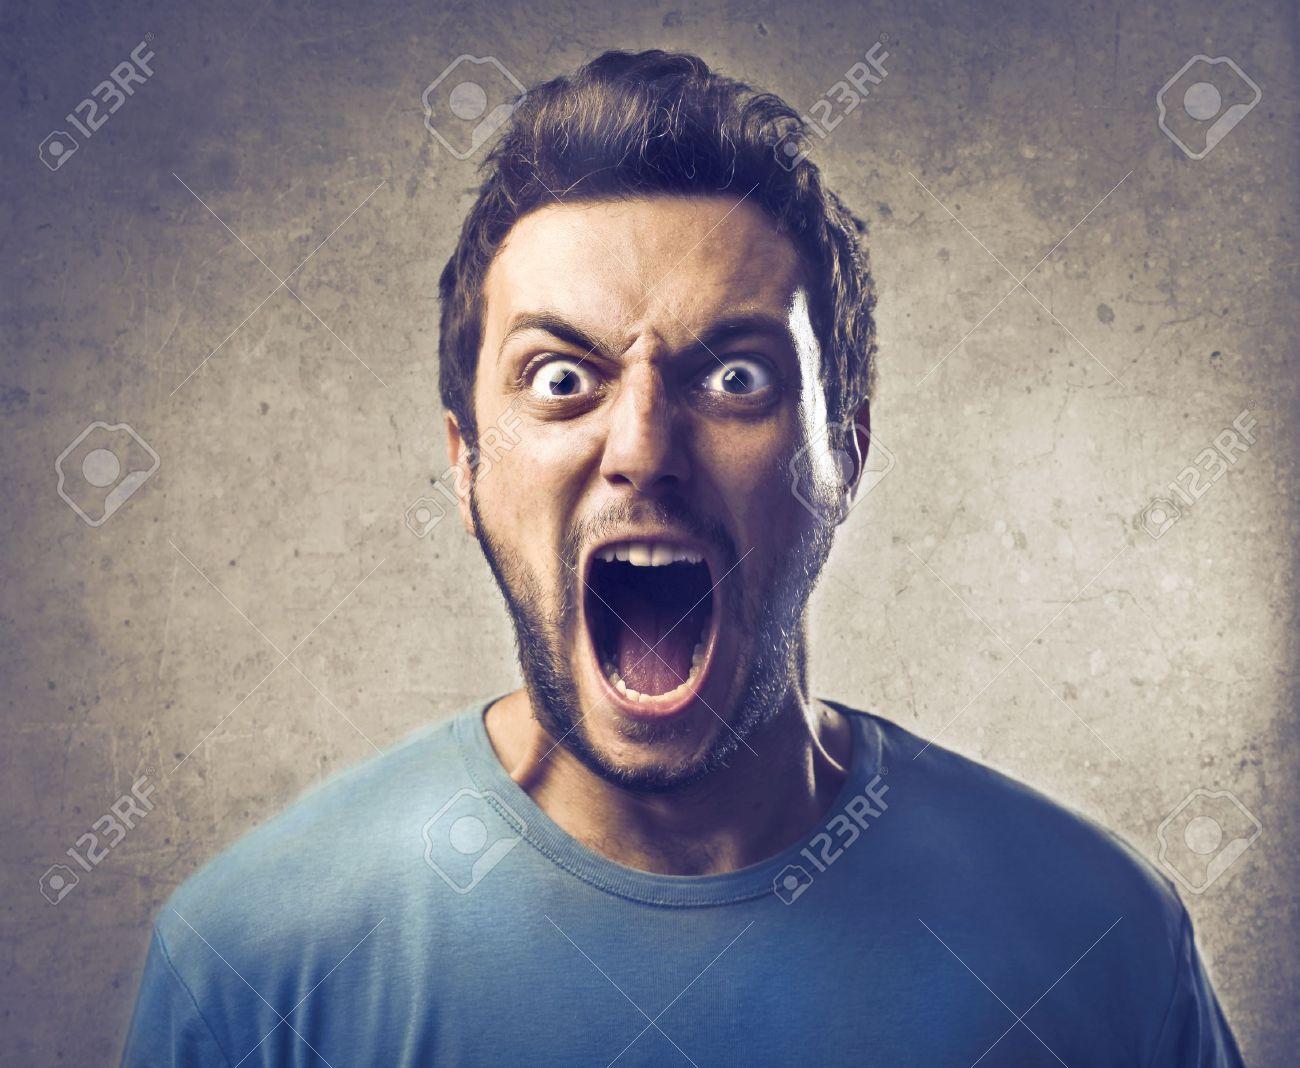 Boy screaming - 15127541